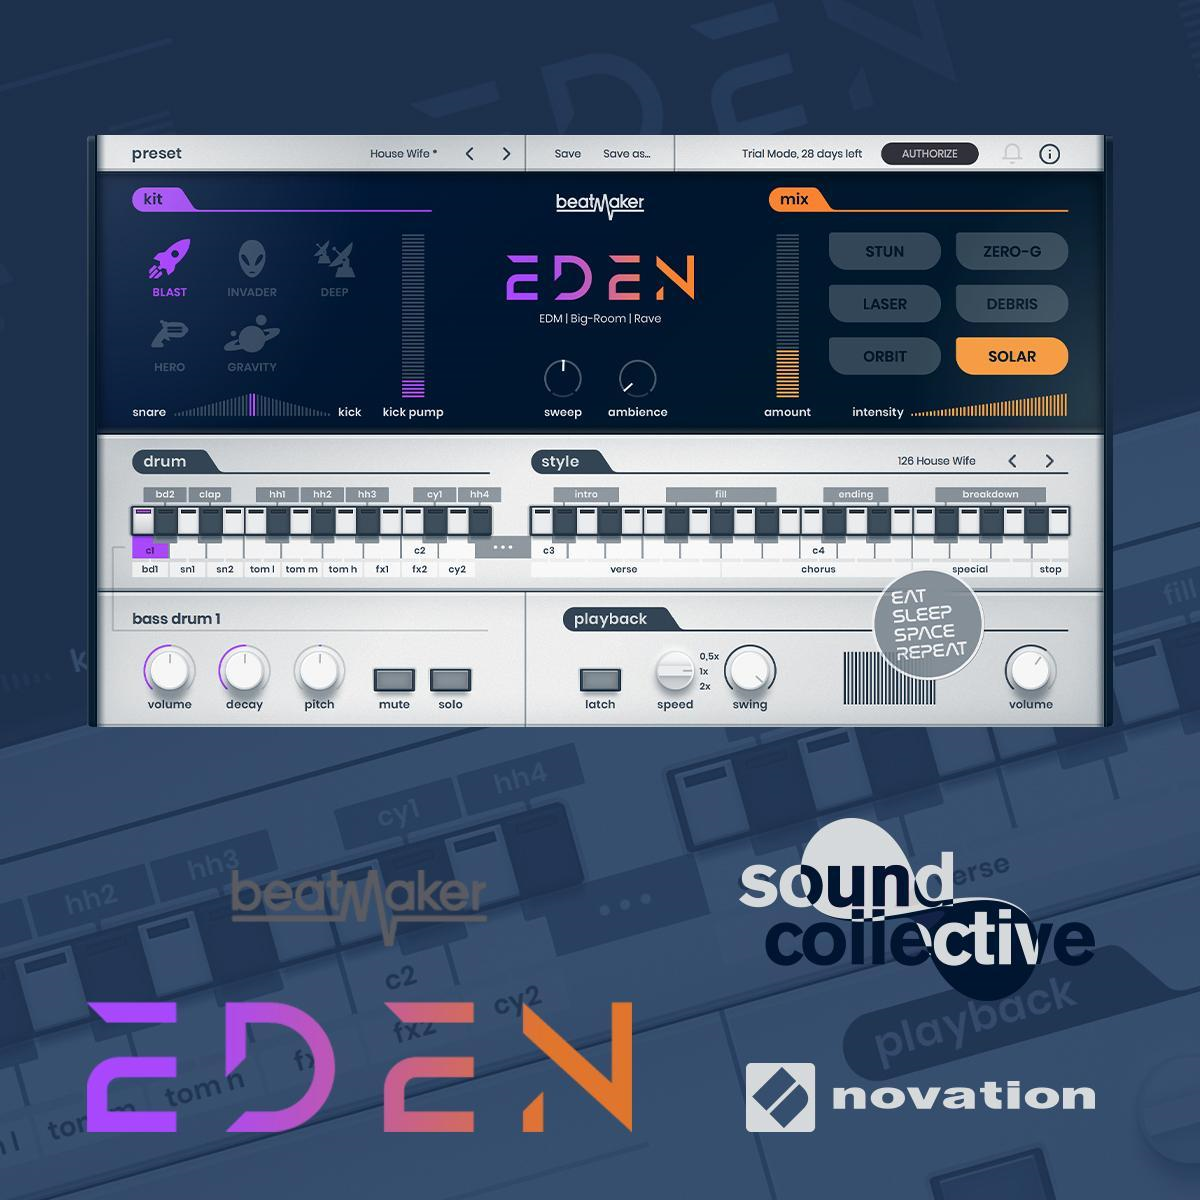 Novation gives Sound Collective members free UJAM Beatmaker